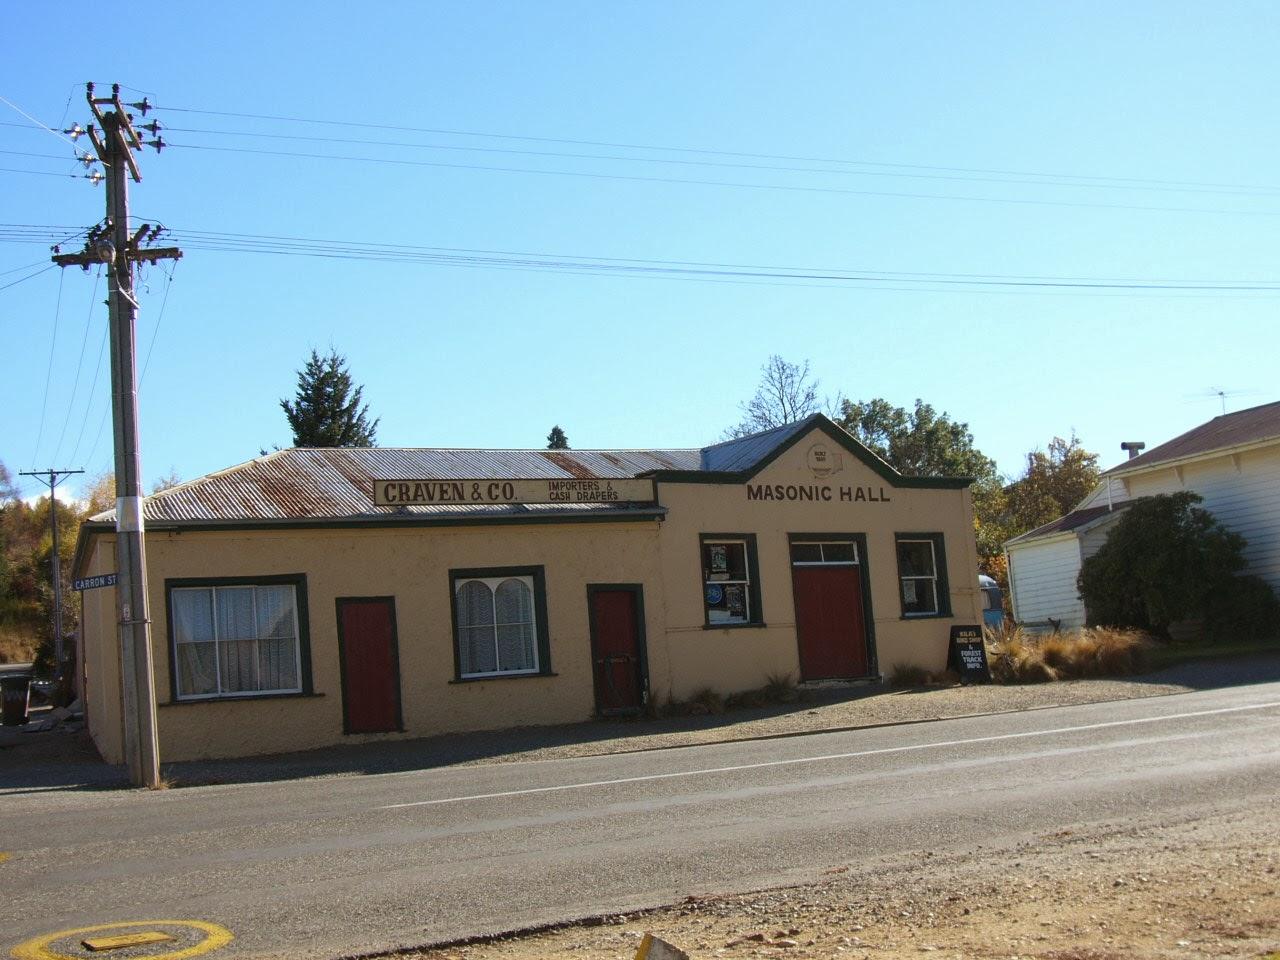 Photo: Masonic Hall; Craven & Co. Importers & Cash Drapers.